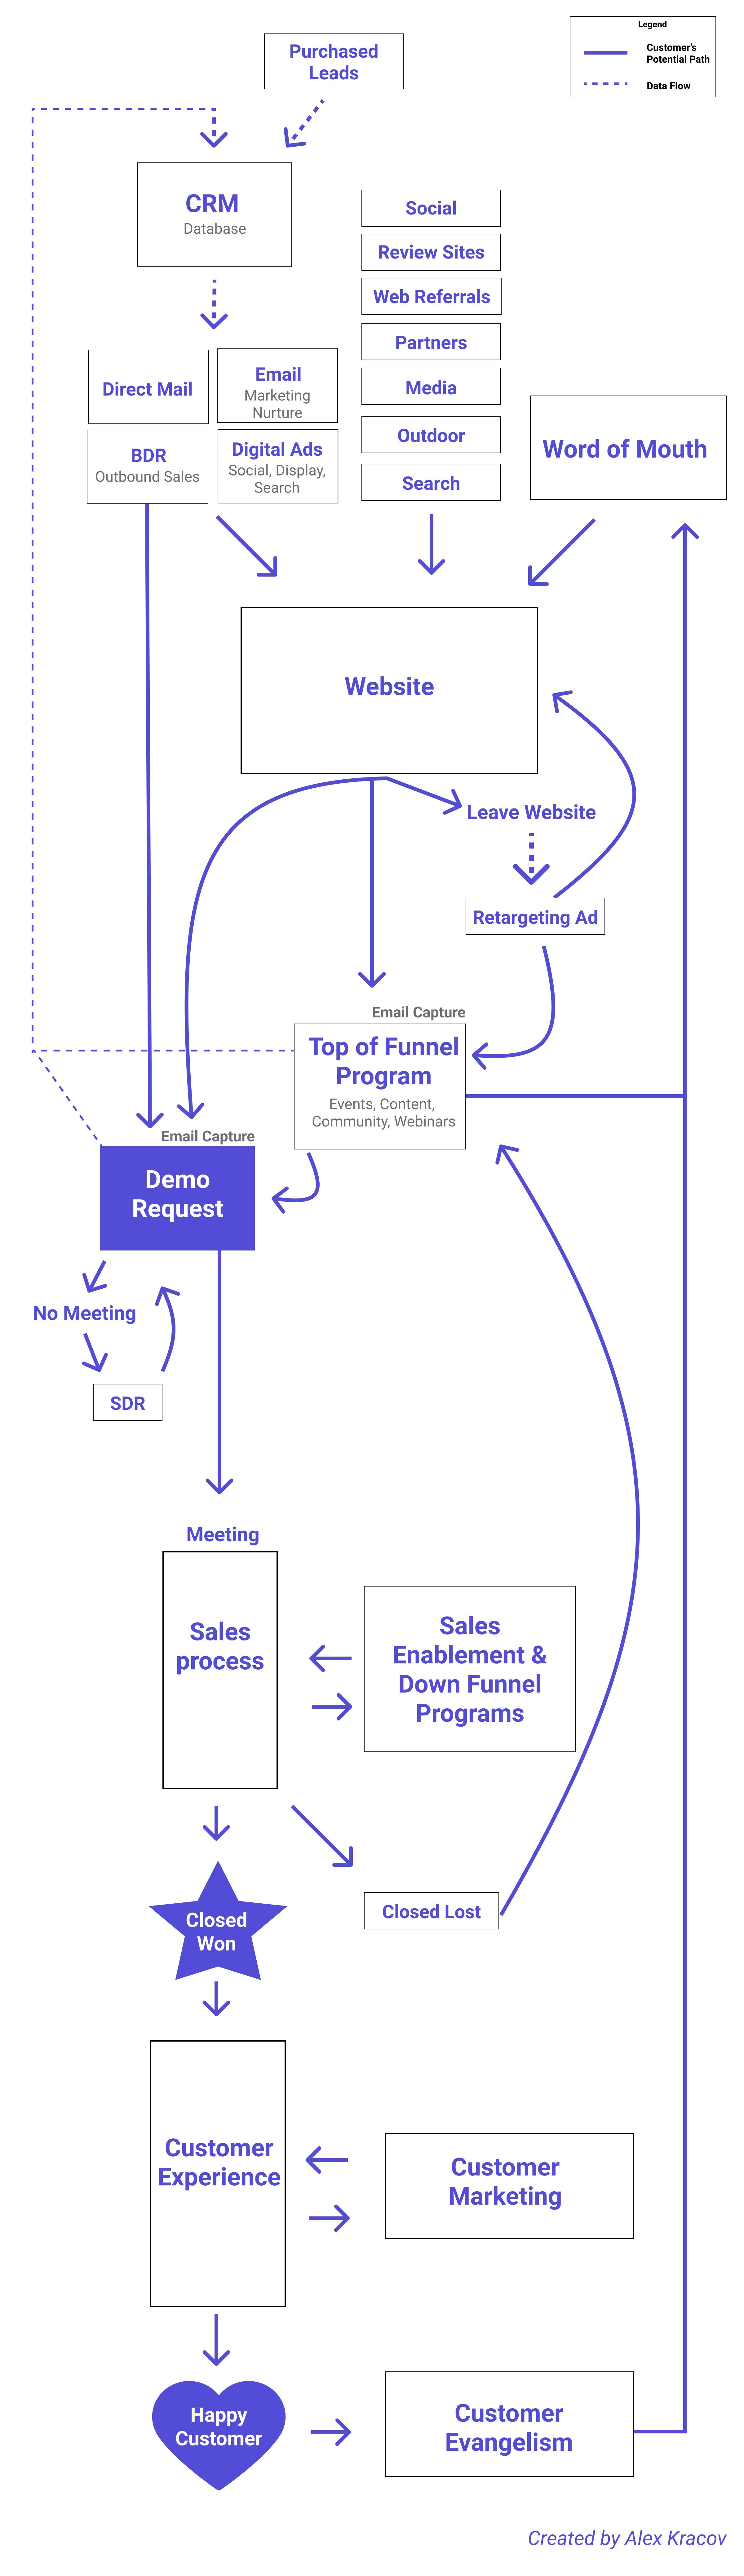 B2B Demand Generation Diagram for SaaS Companies